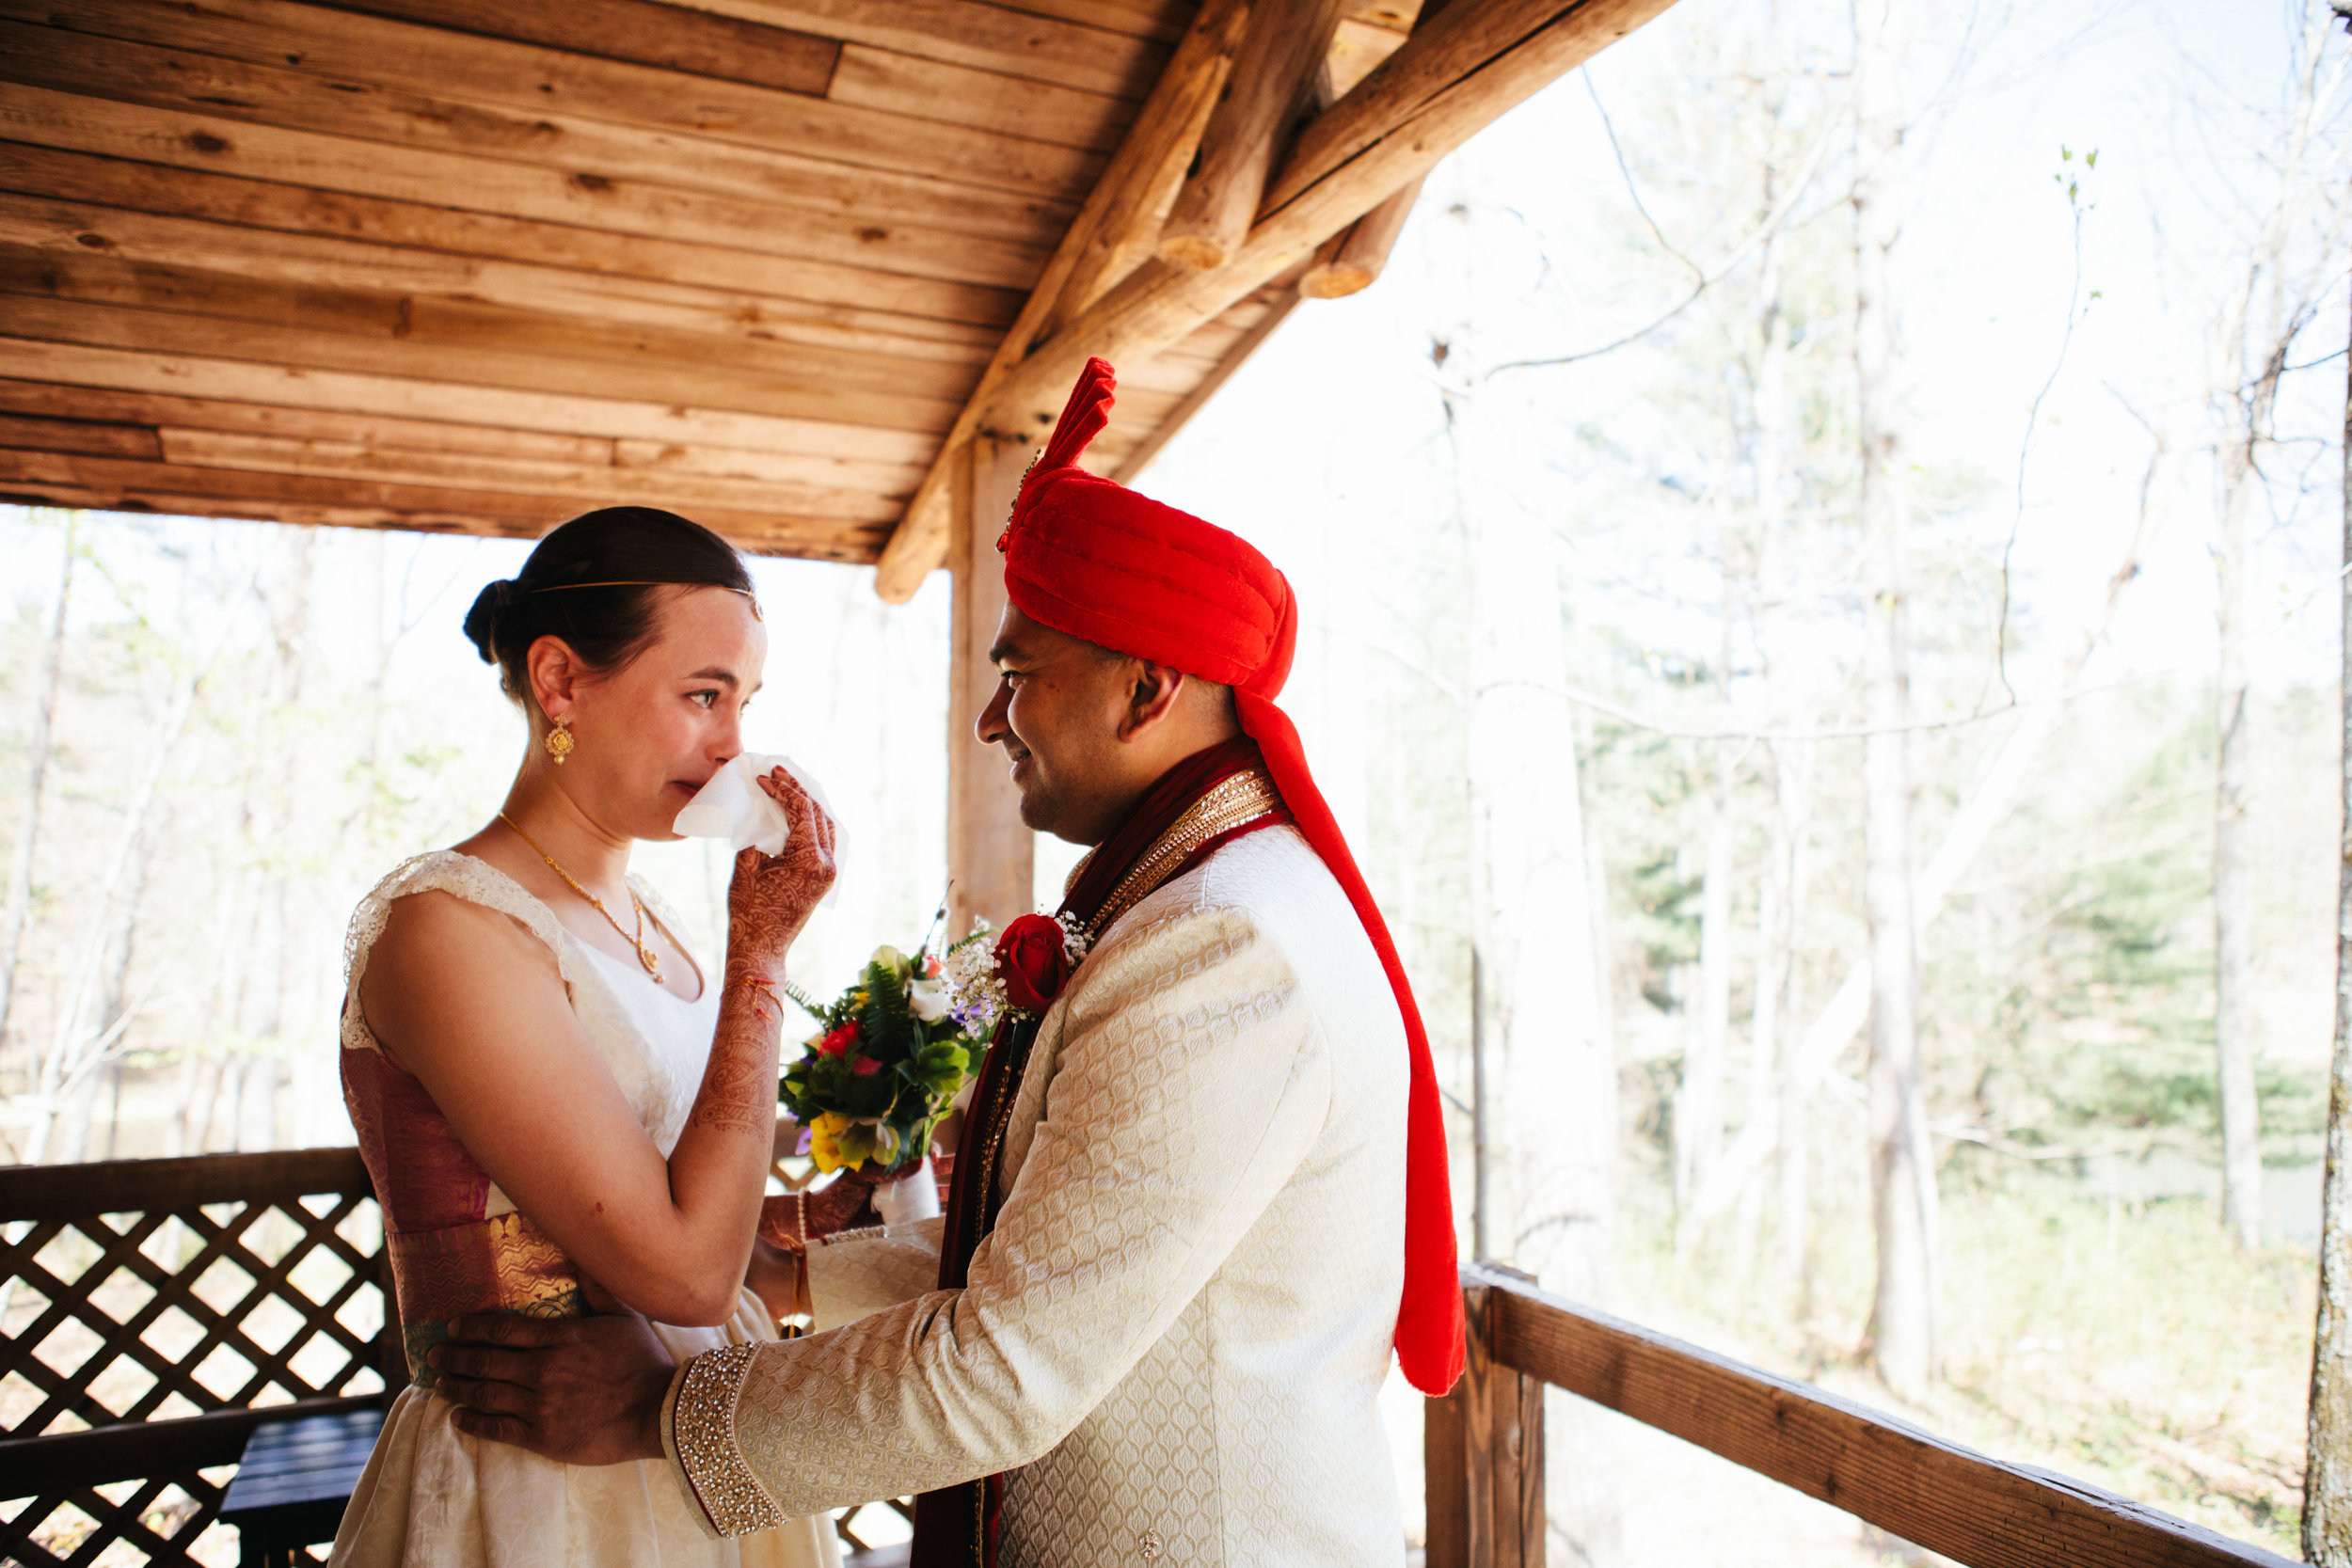 maine-interfaith-wedding-photographer-26.jpg